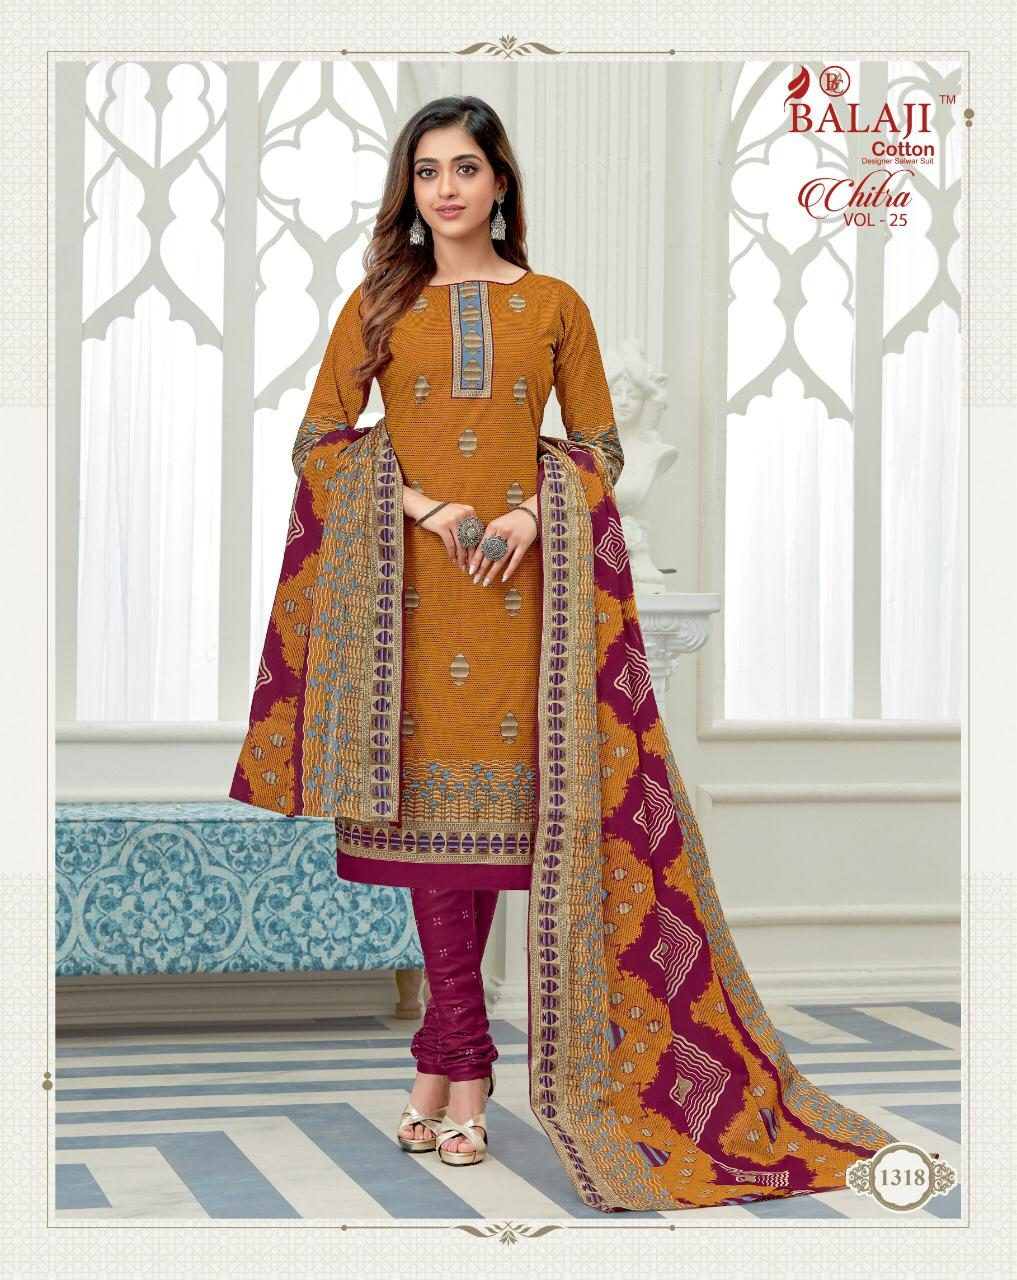 Balaji-Chitra-Vol-25-19